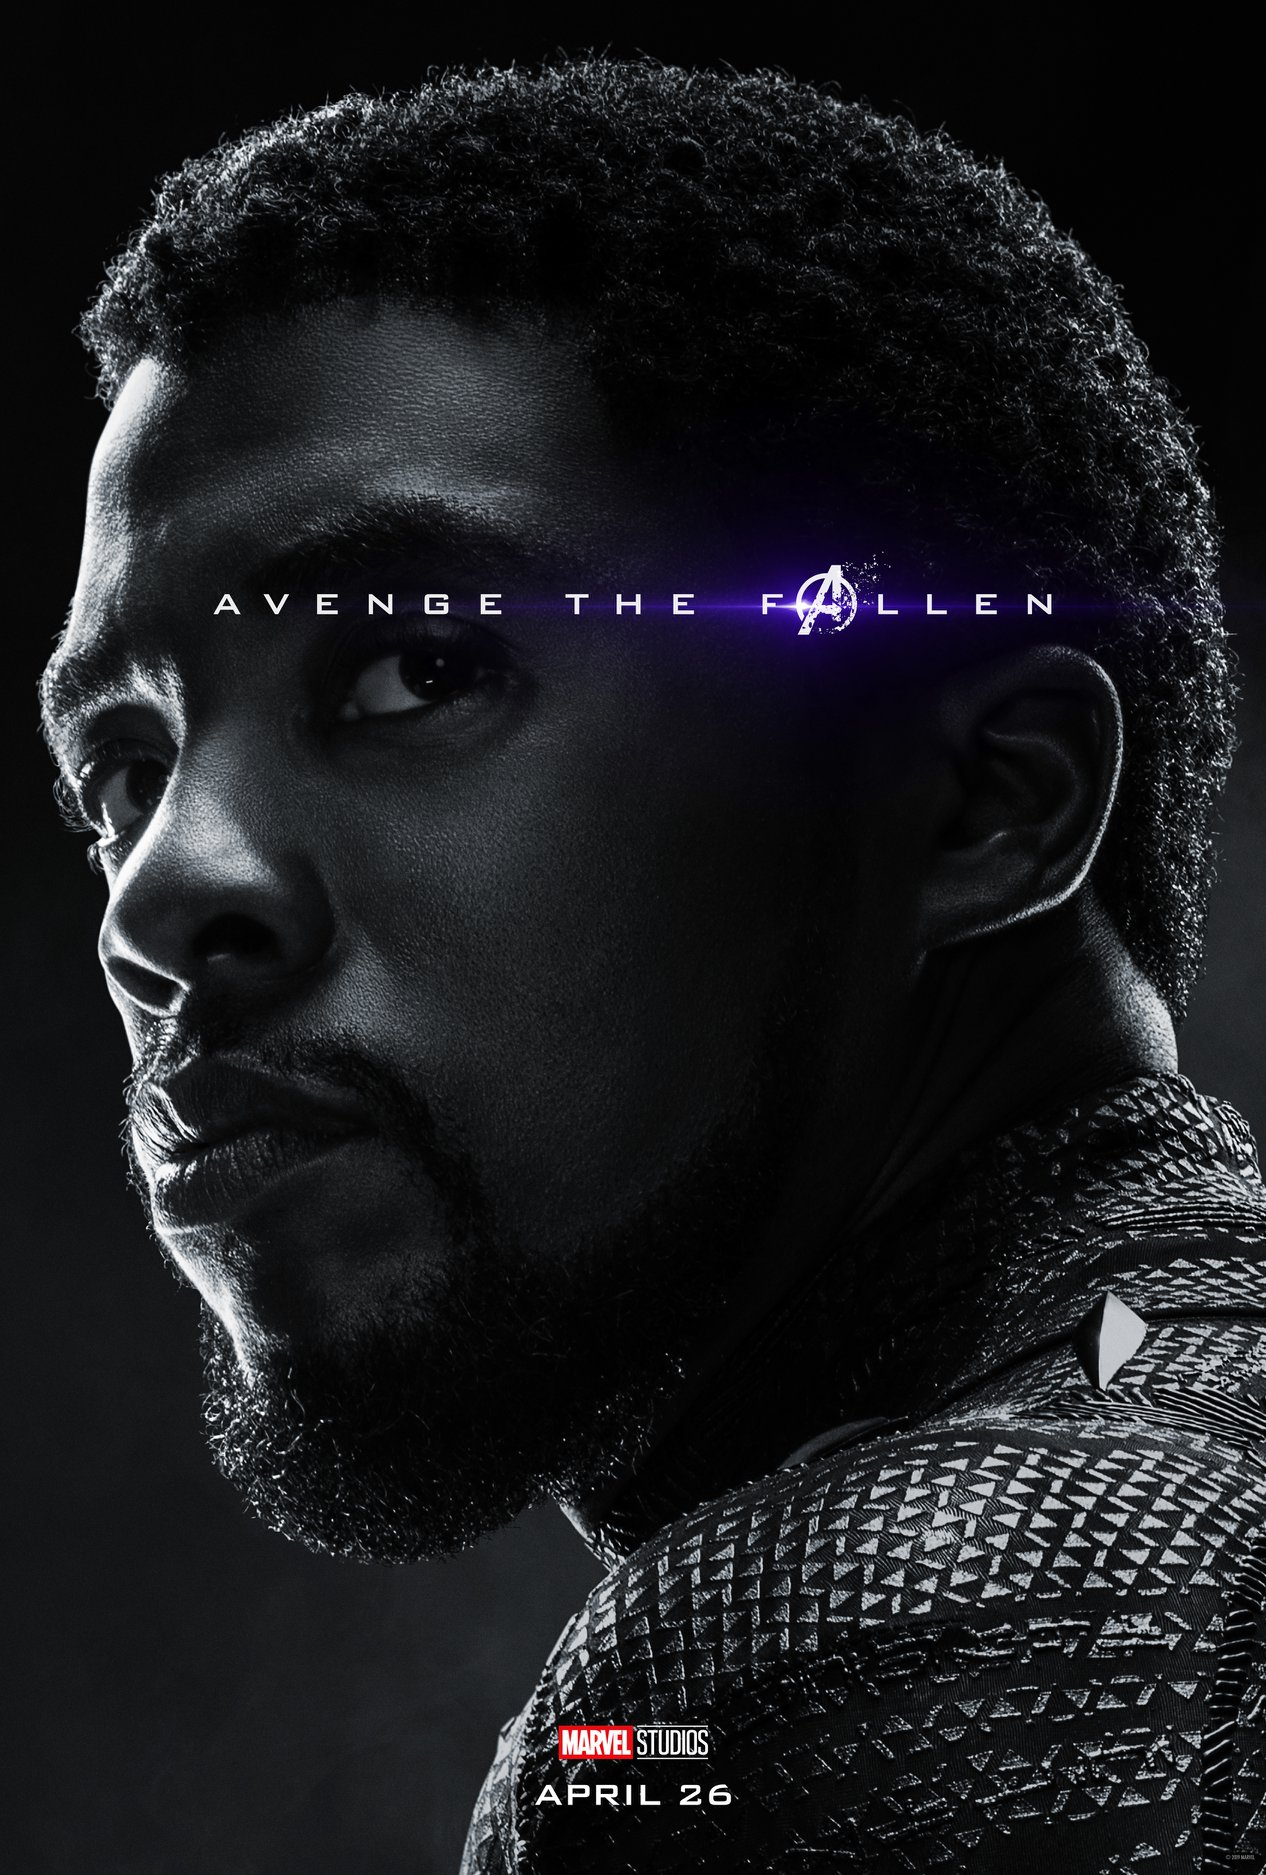 avengers_endgame_p20.png